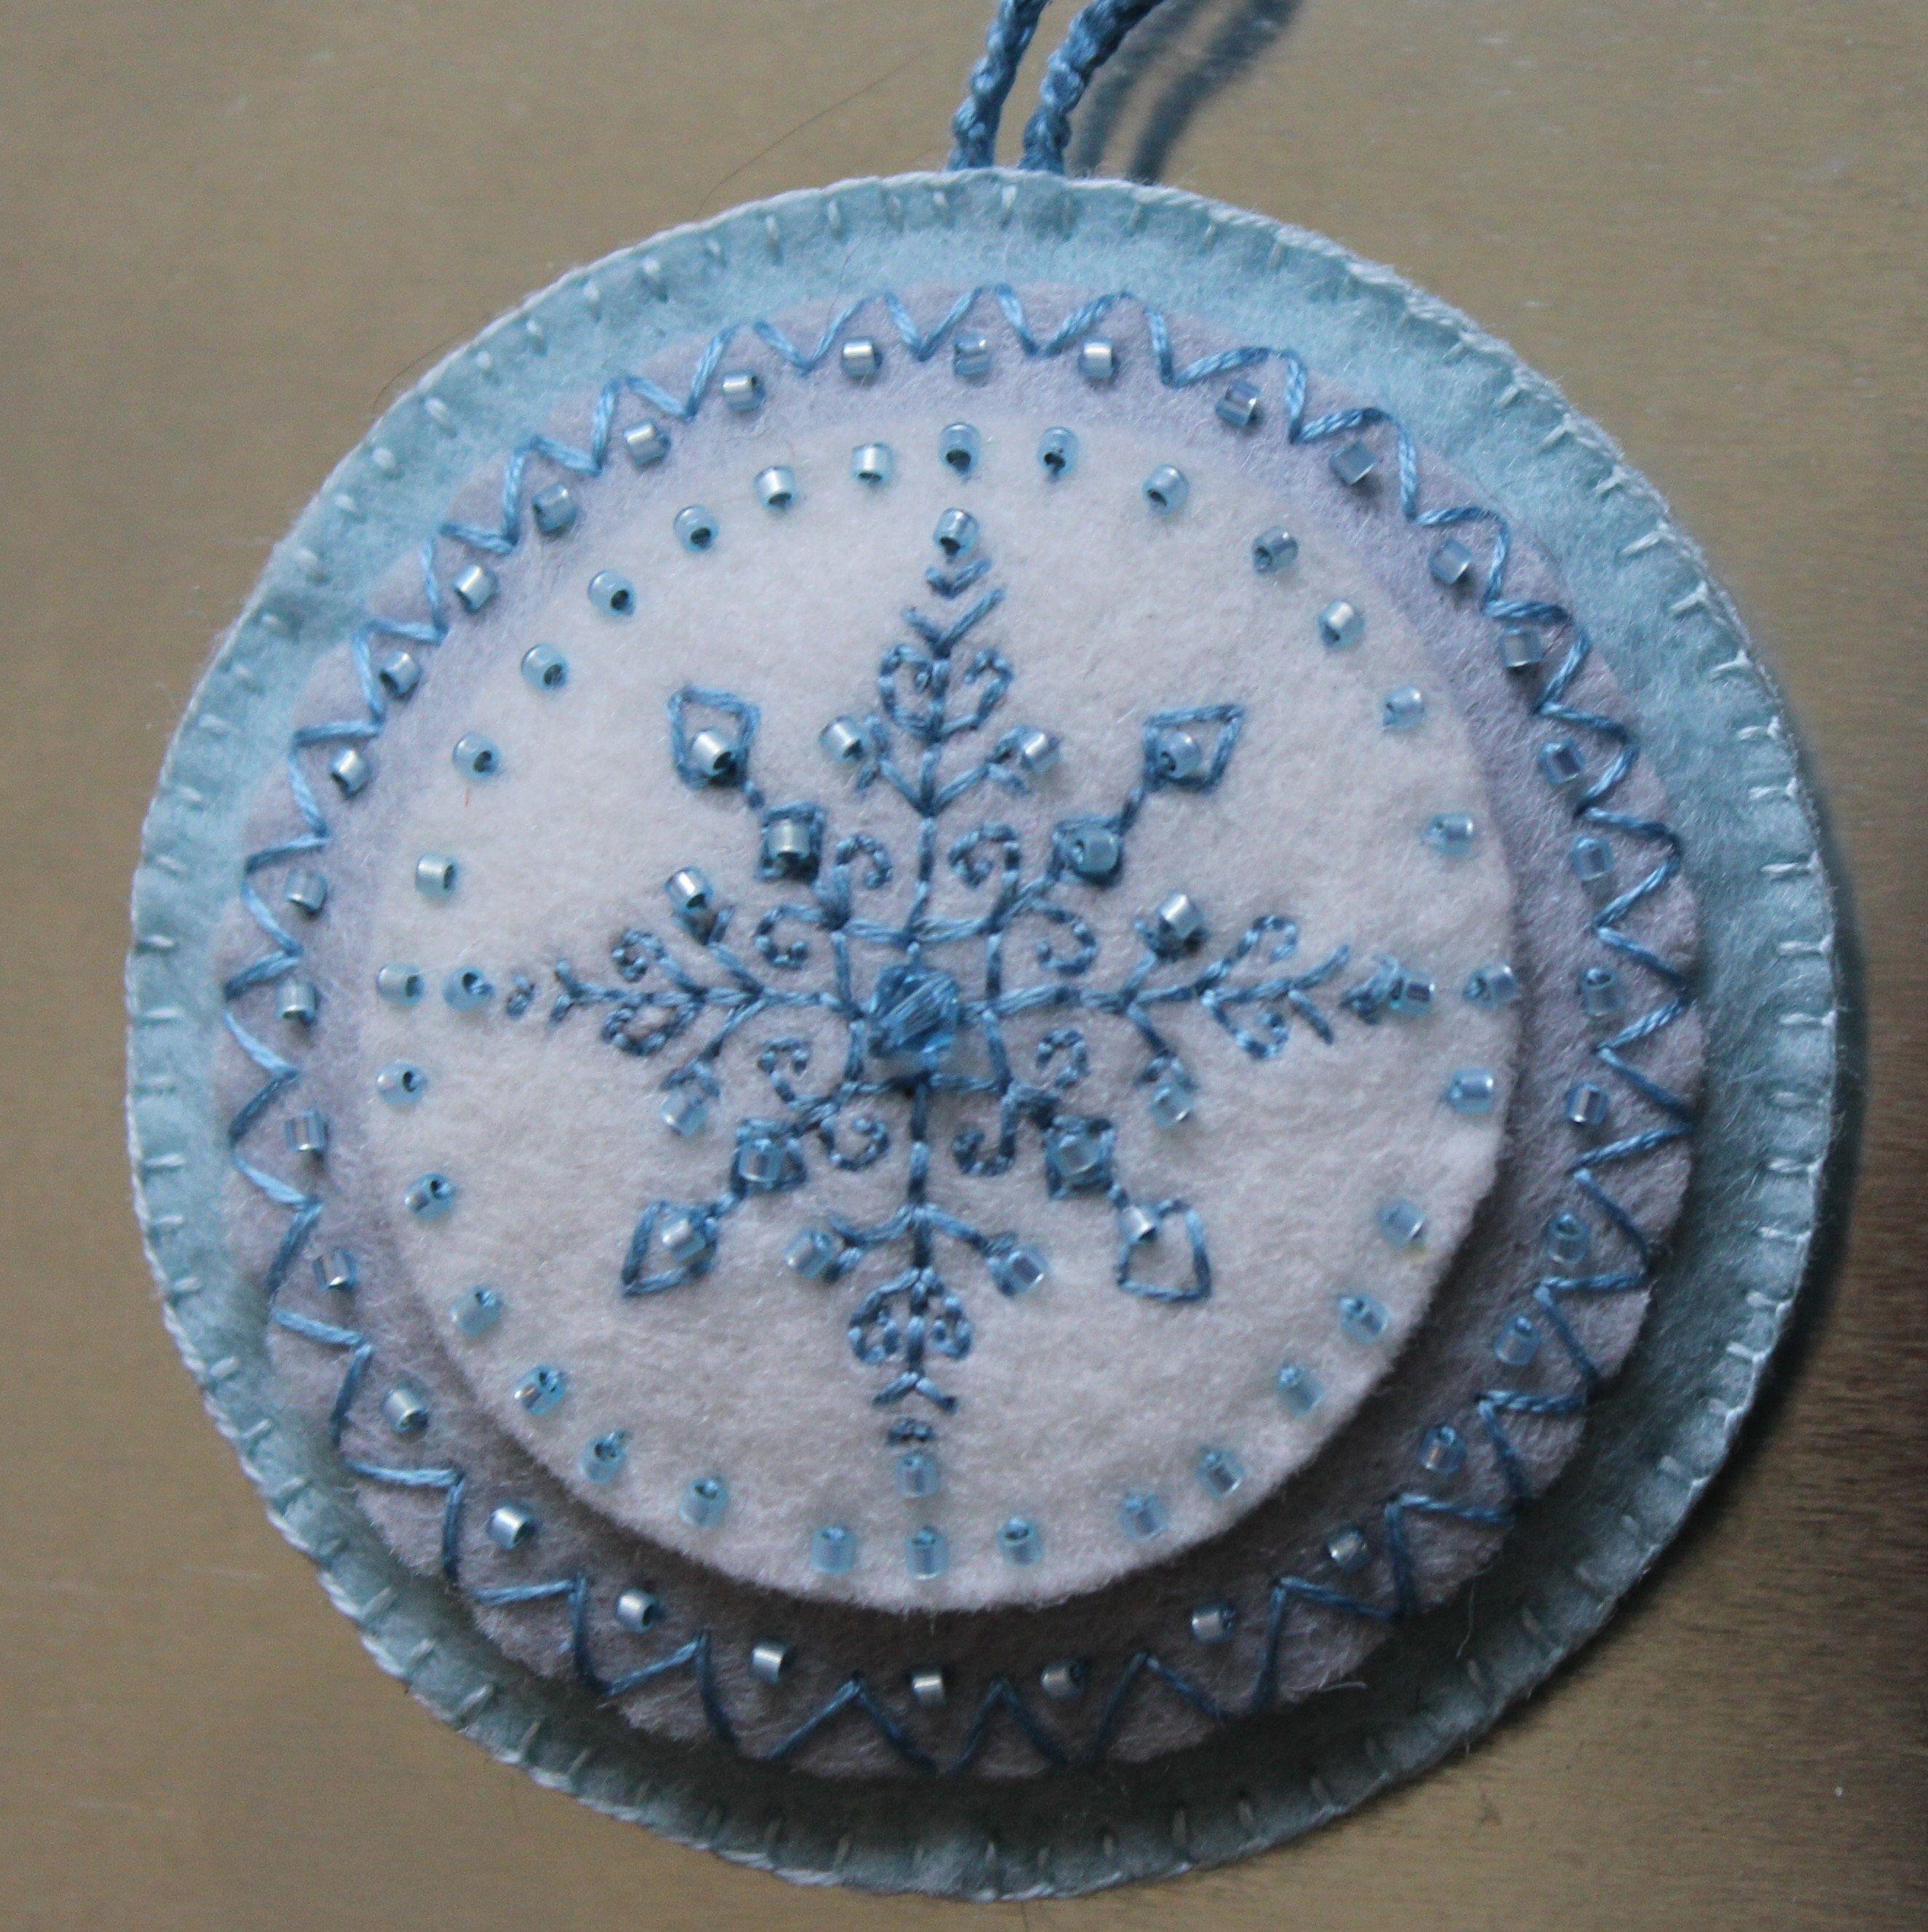 Embroidered Felt Ornament 3in Round Felt Ornament Embroidered Etsy Felt Ornaments Felt Birds Ornaments March Birth Stone